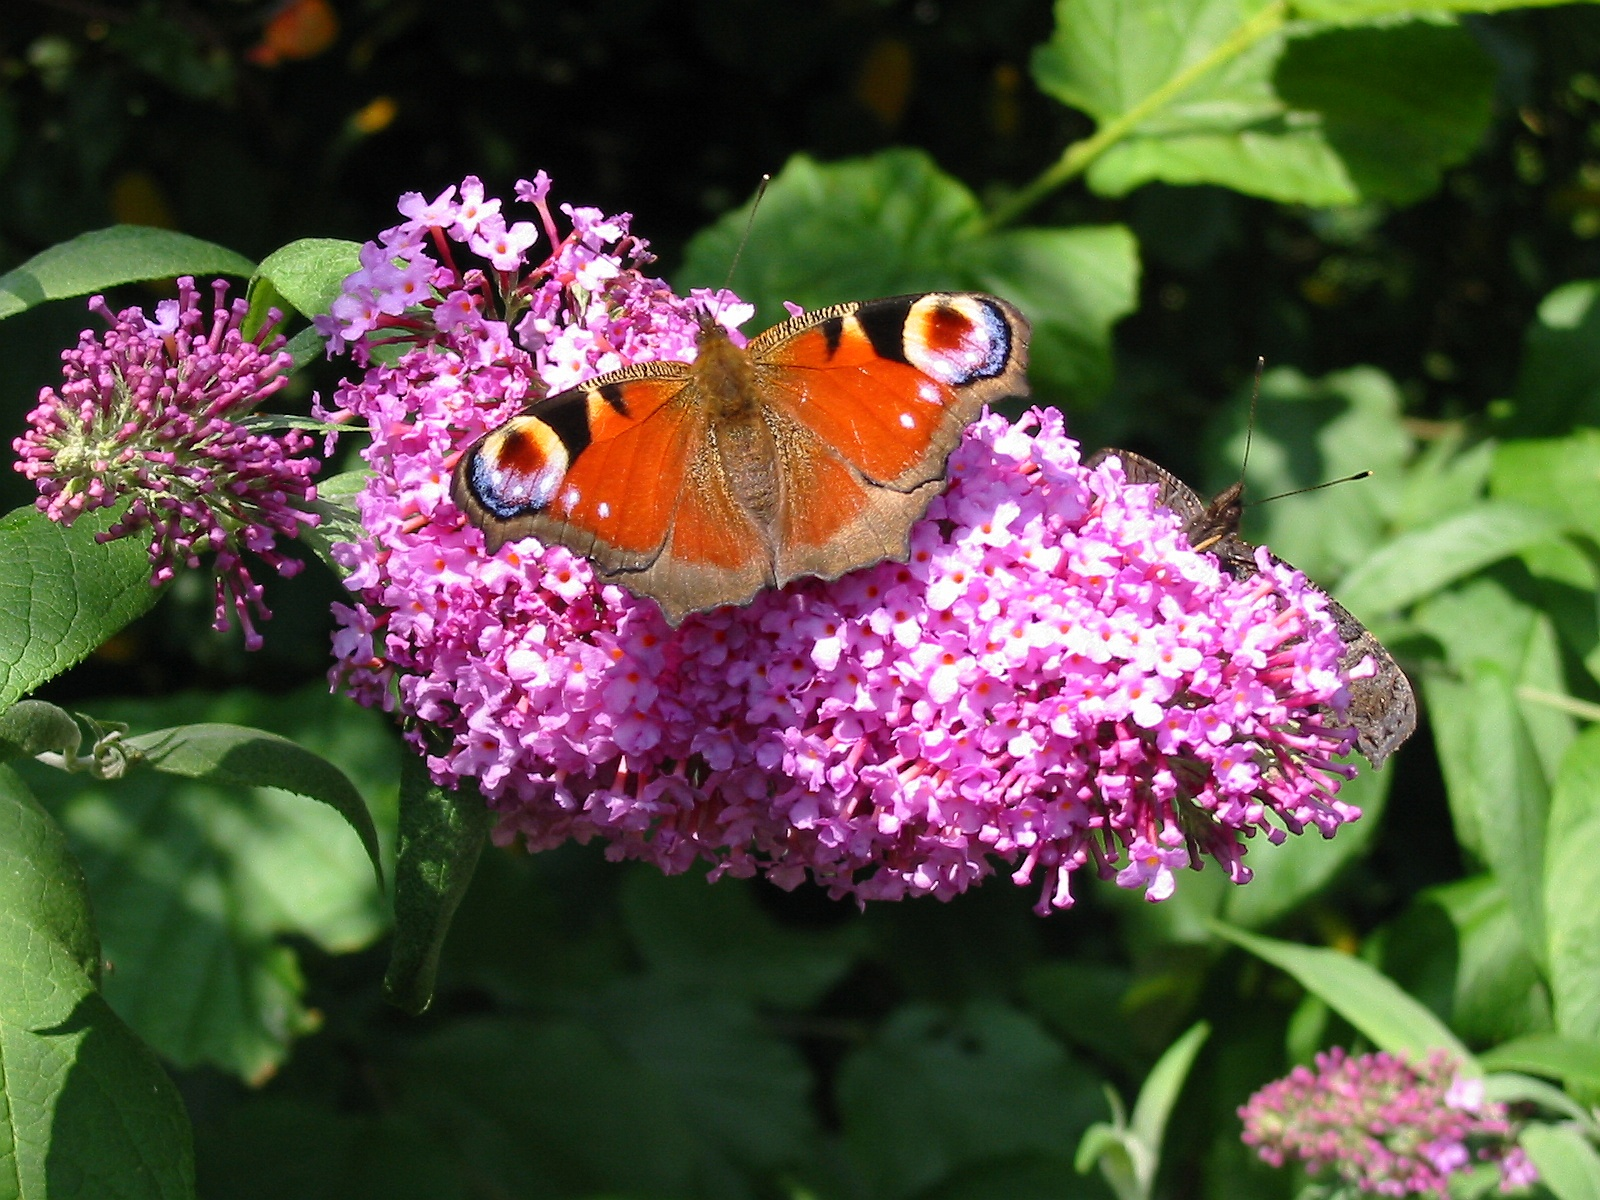 Bestand Dagpauwoog Op Vlinderstruik Jpg Wikipedia